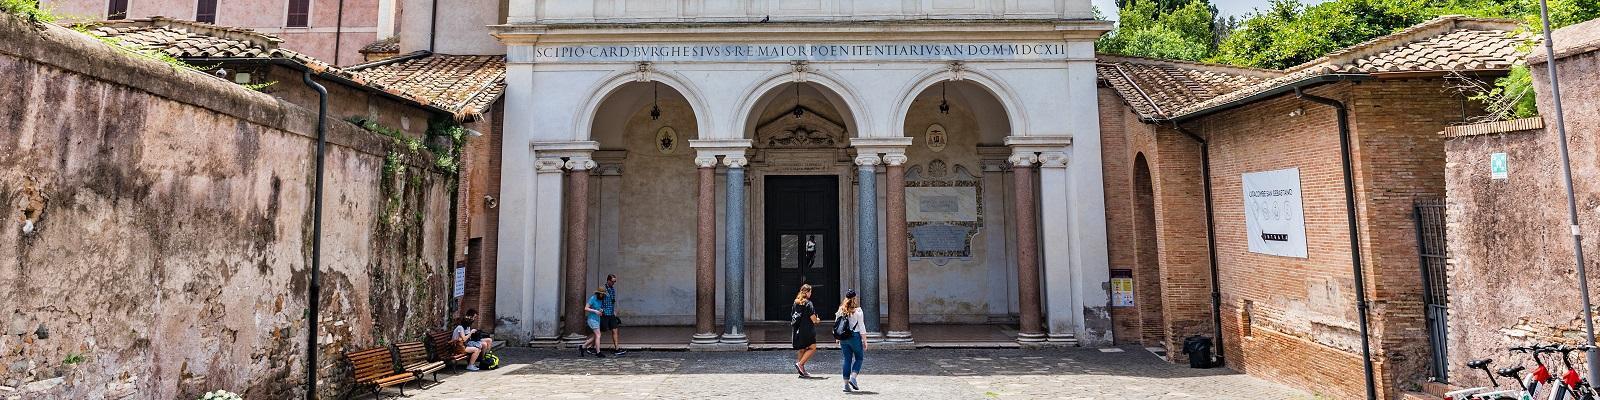 The Catacombs of St. Sebastian in Rome